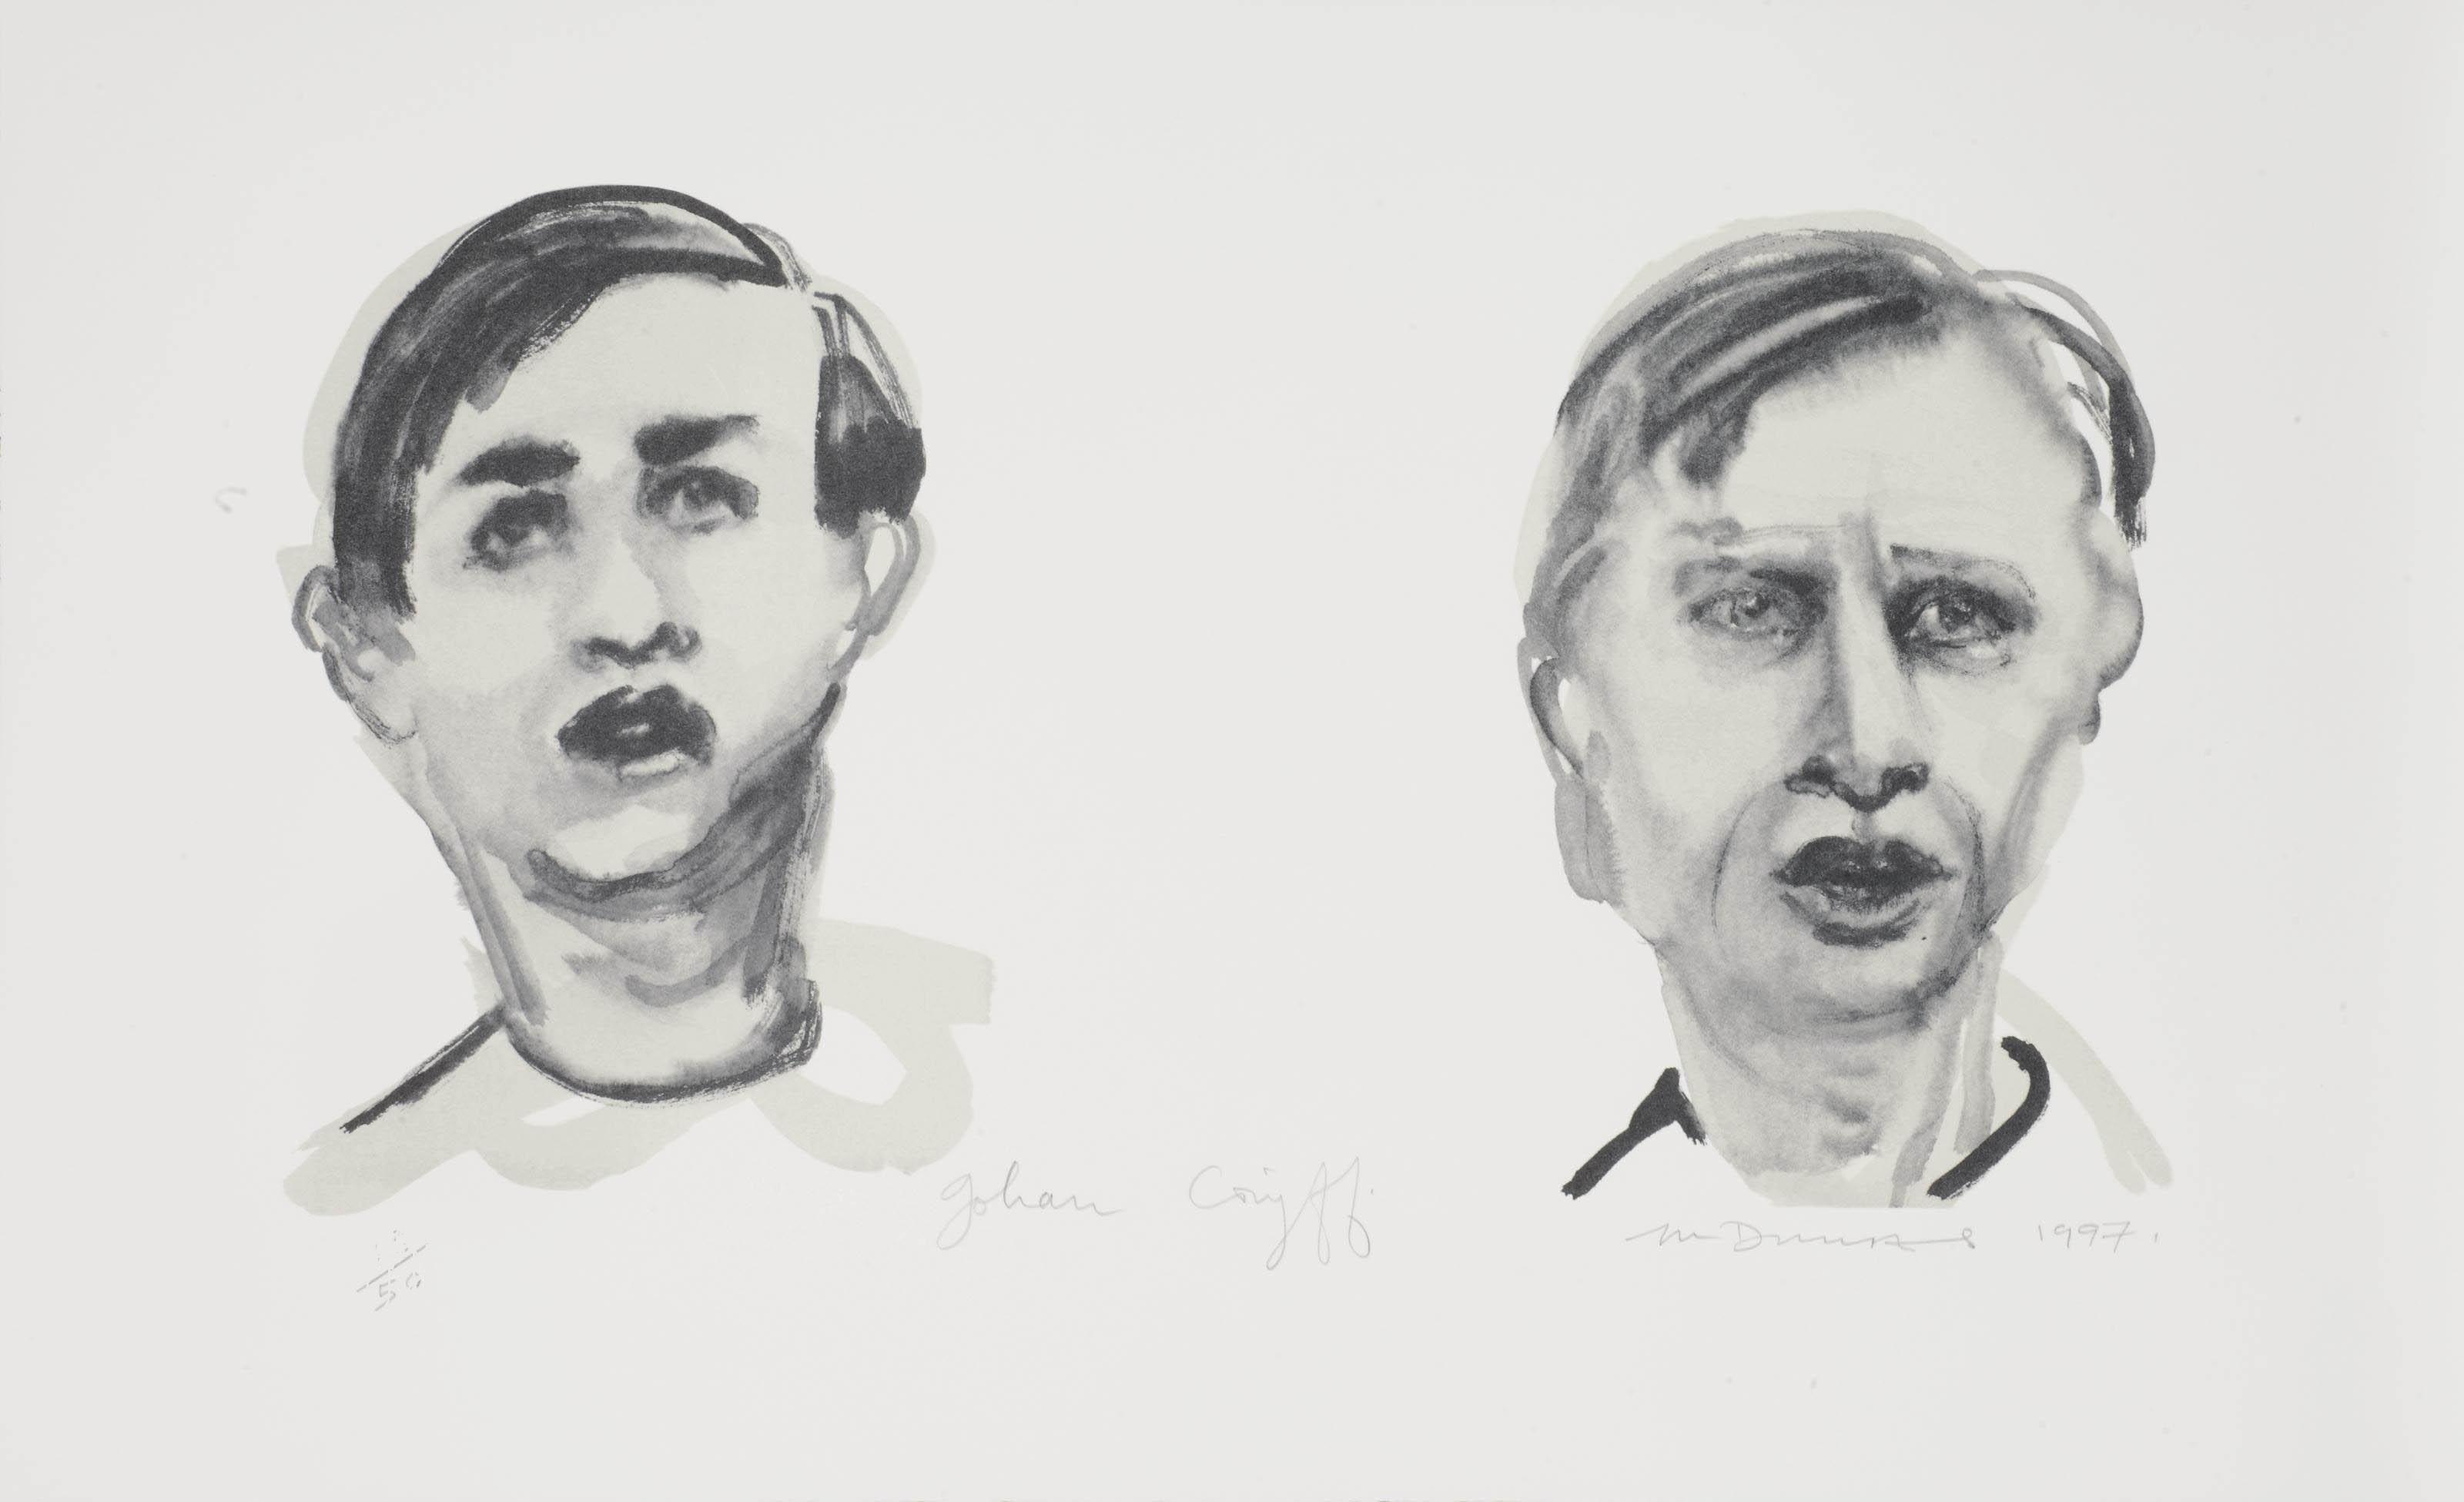 Johan Cruyff (dubbelportret)